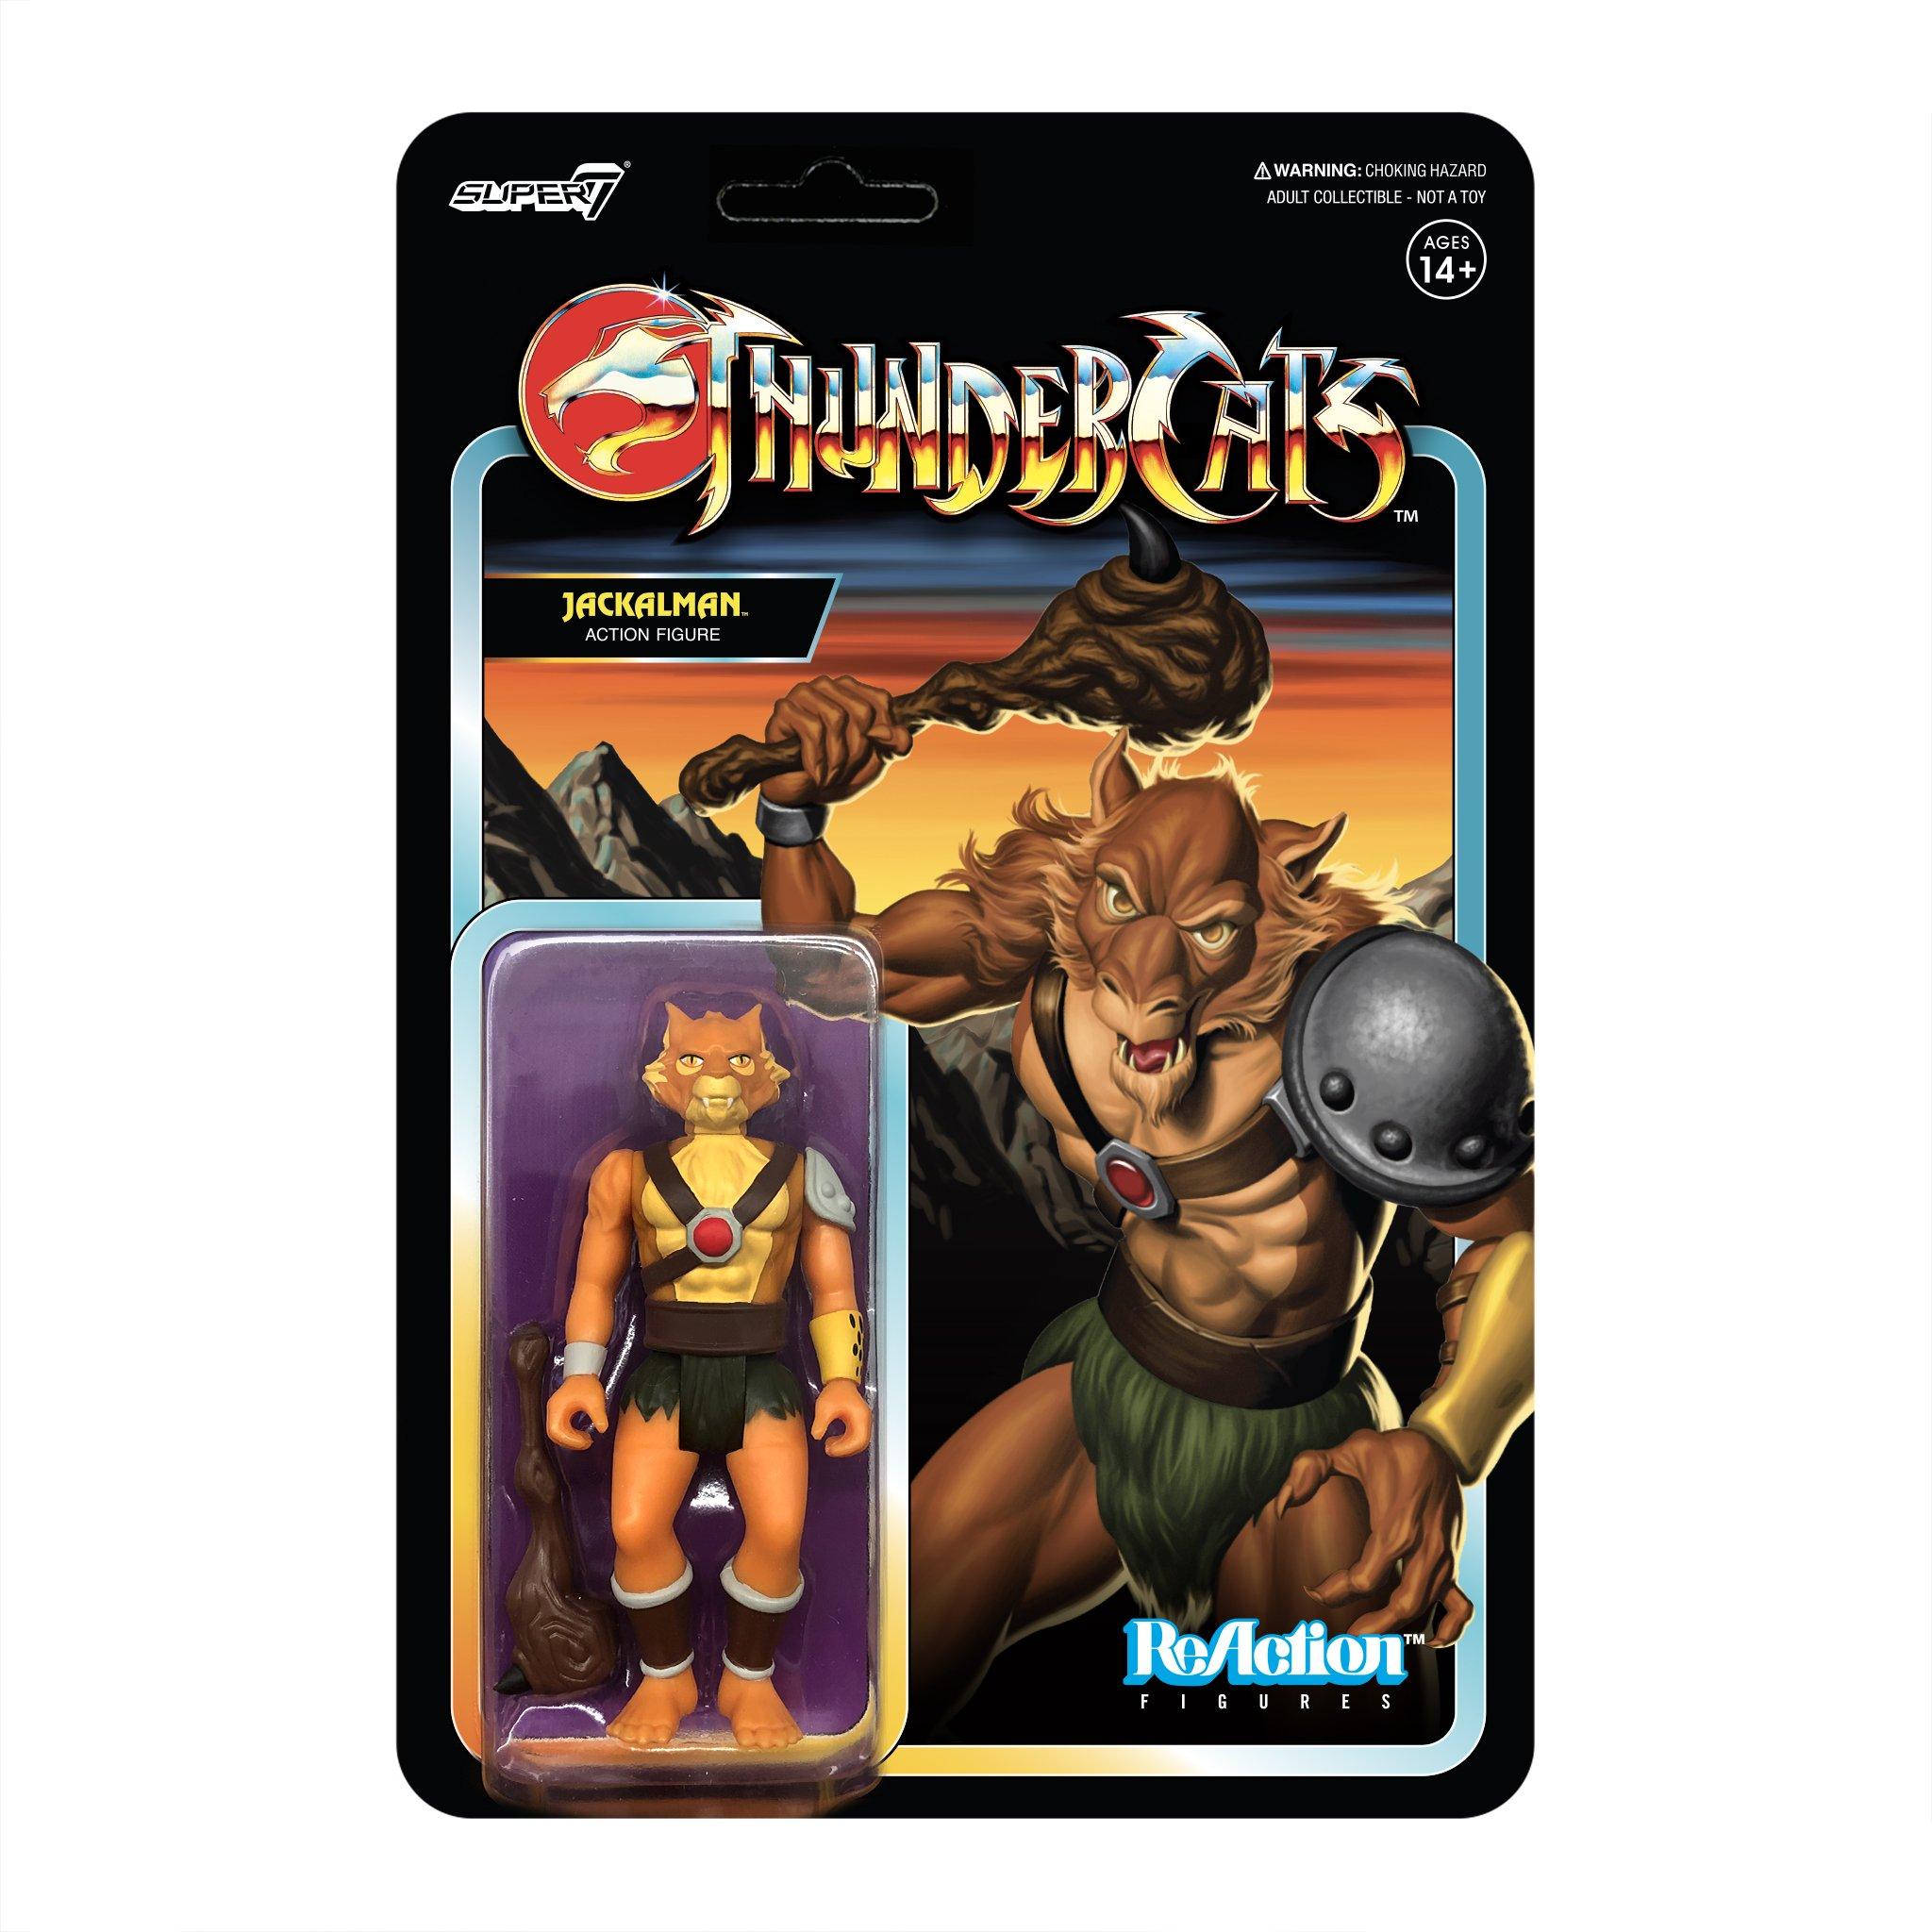 Thundercats: Jackalman Reaction Figure